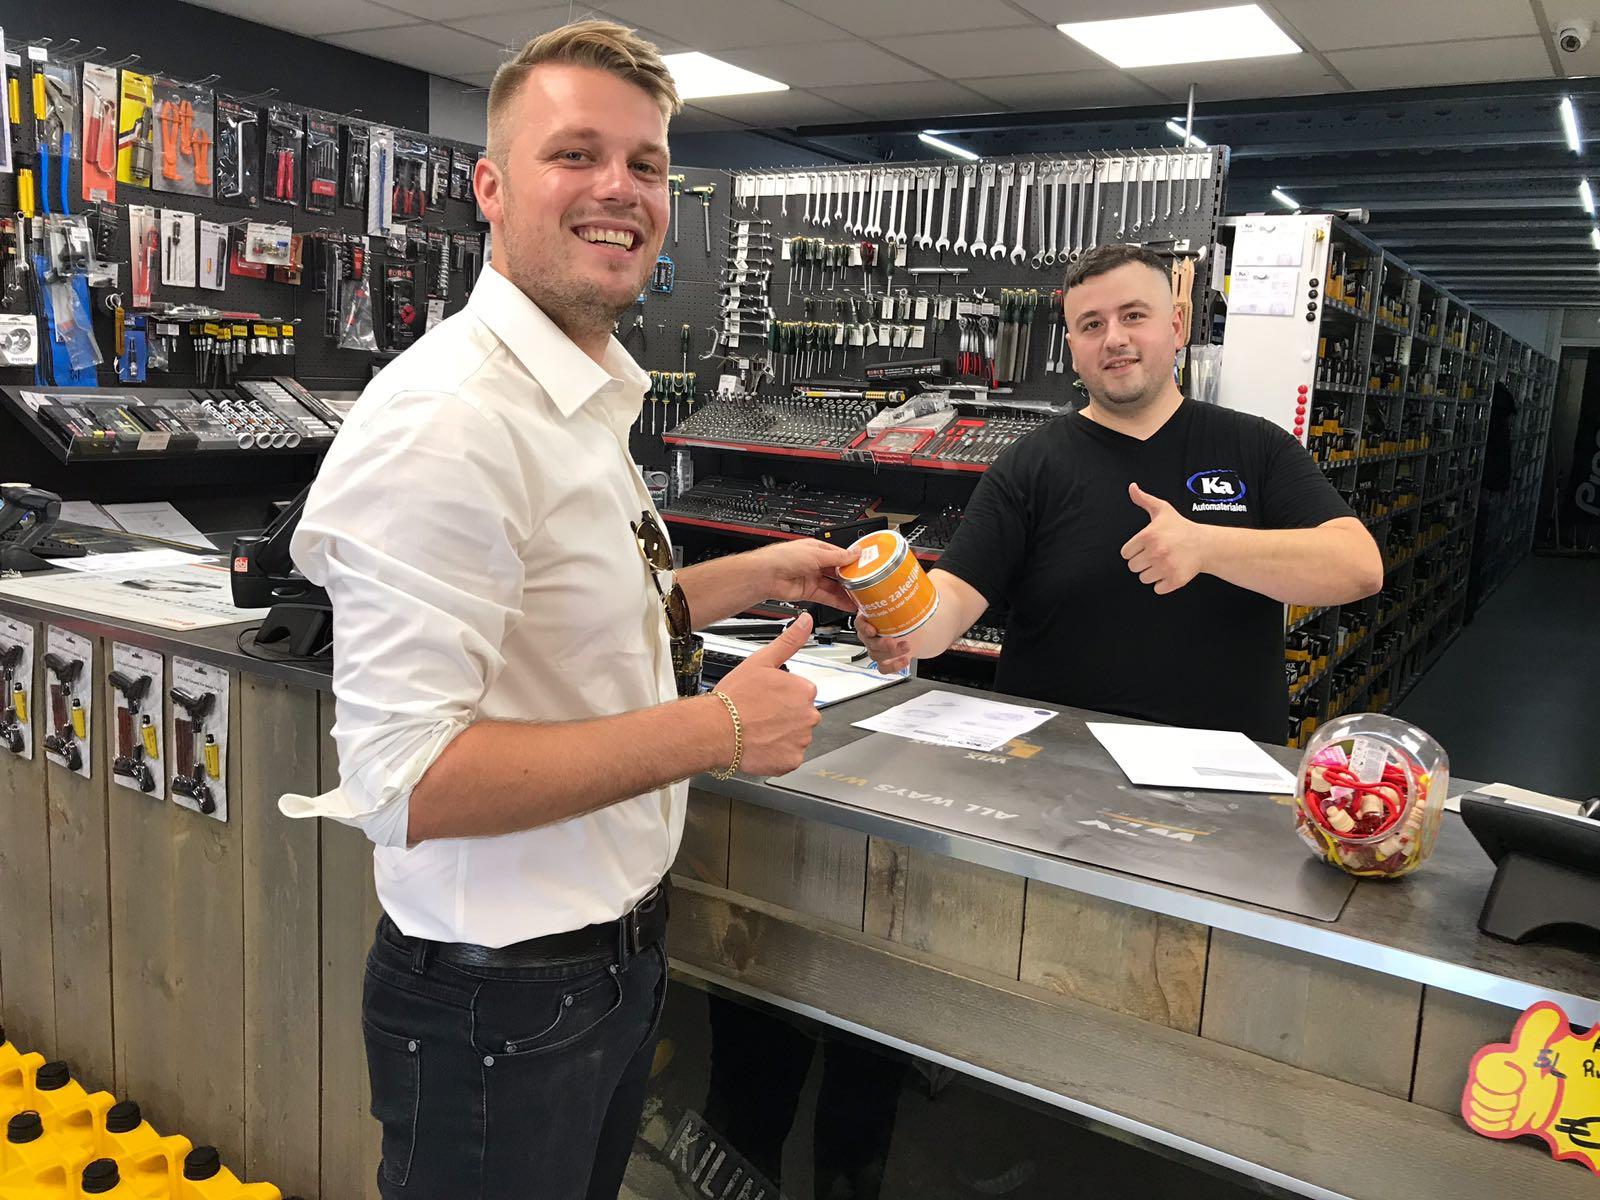 Host maakt klant blij